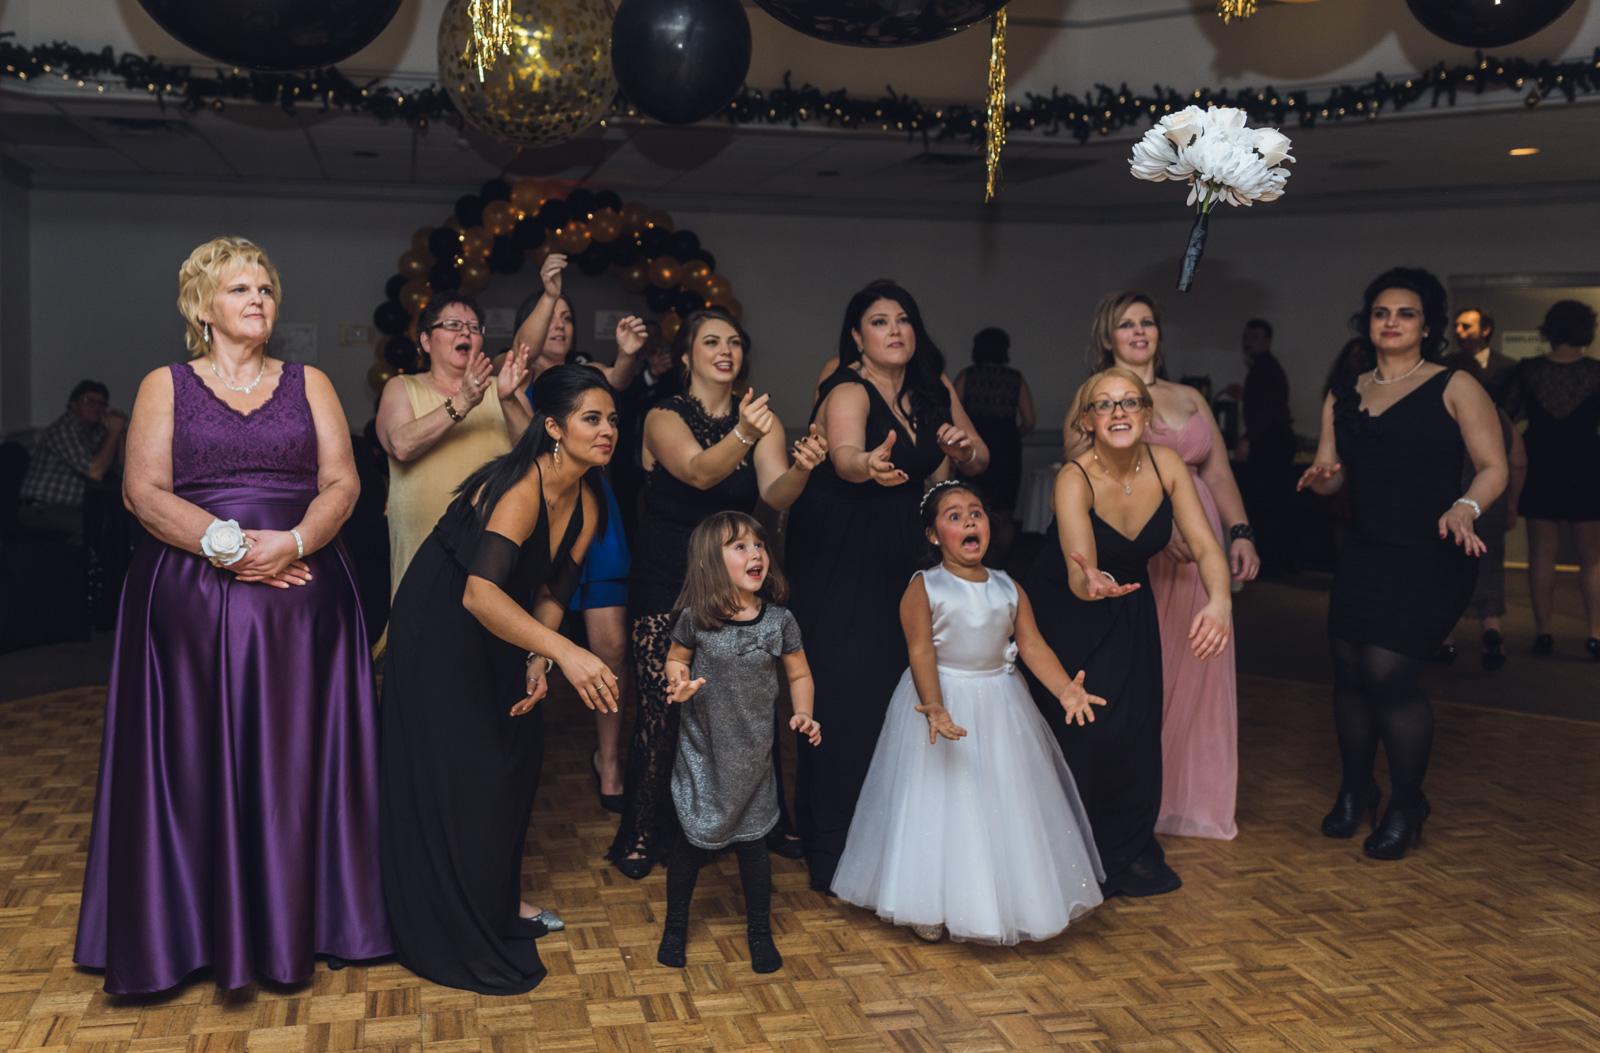 rheana-chris-wedding-blog-315.jpg